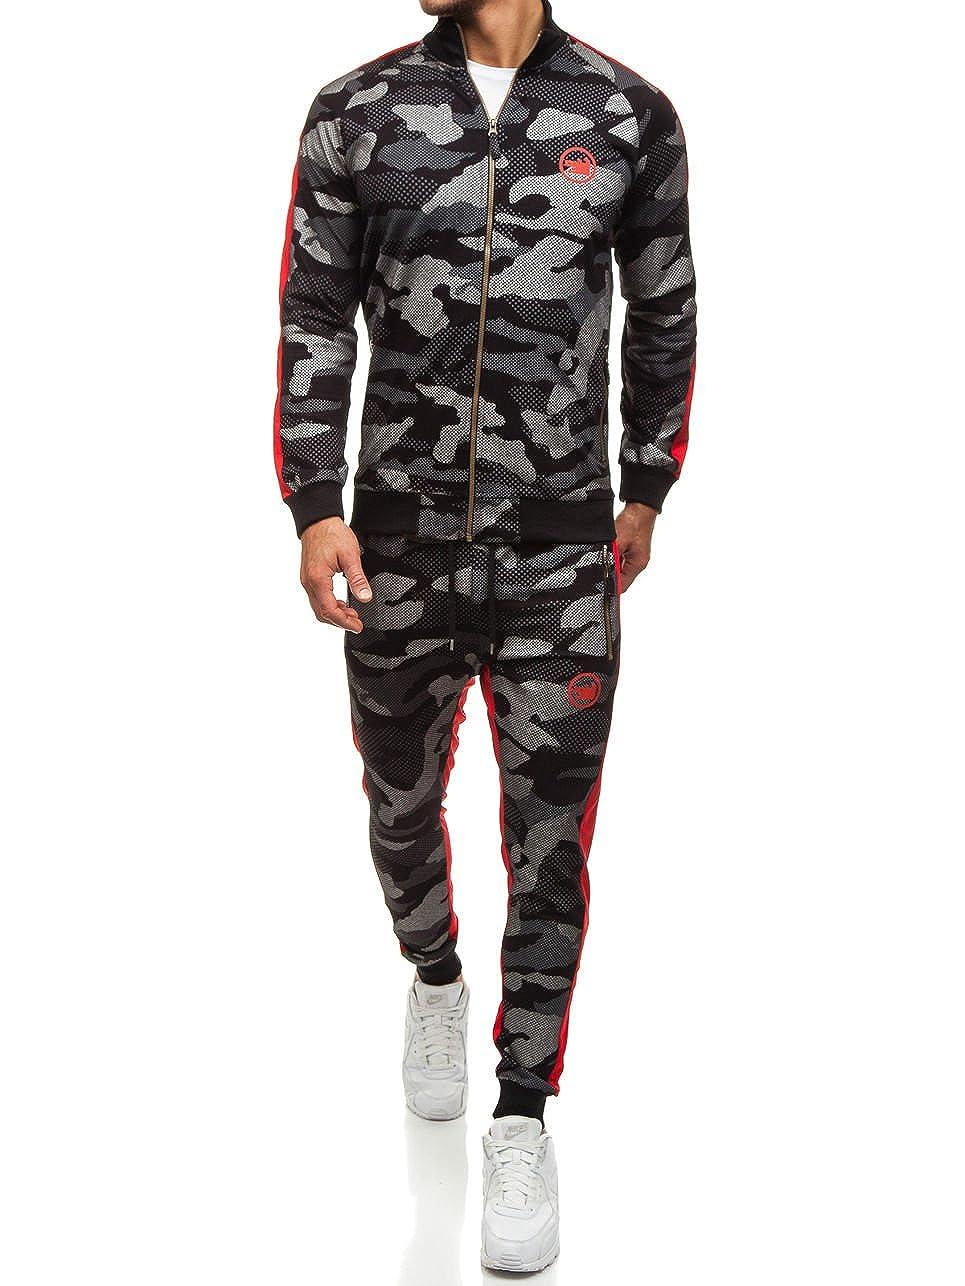 BOLF Herren Jogginganzug Sportanzug Sweatshirt Sporthose Sport Training 8H8 Motiv CATCH 0944